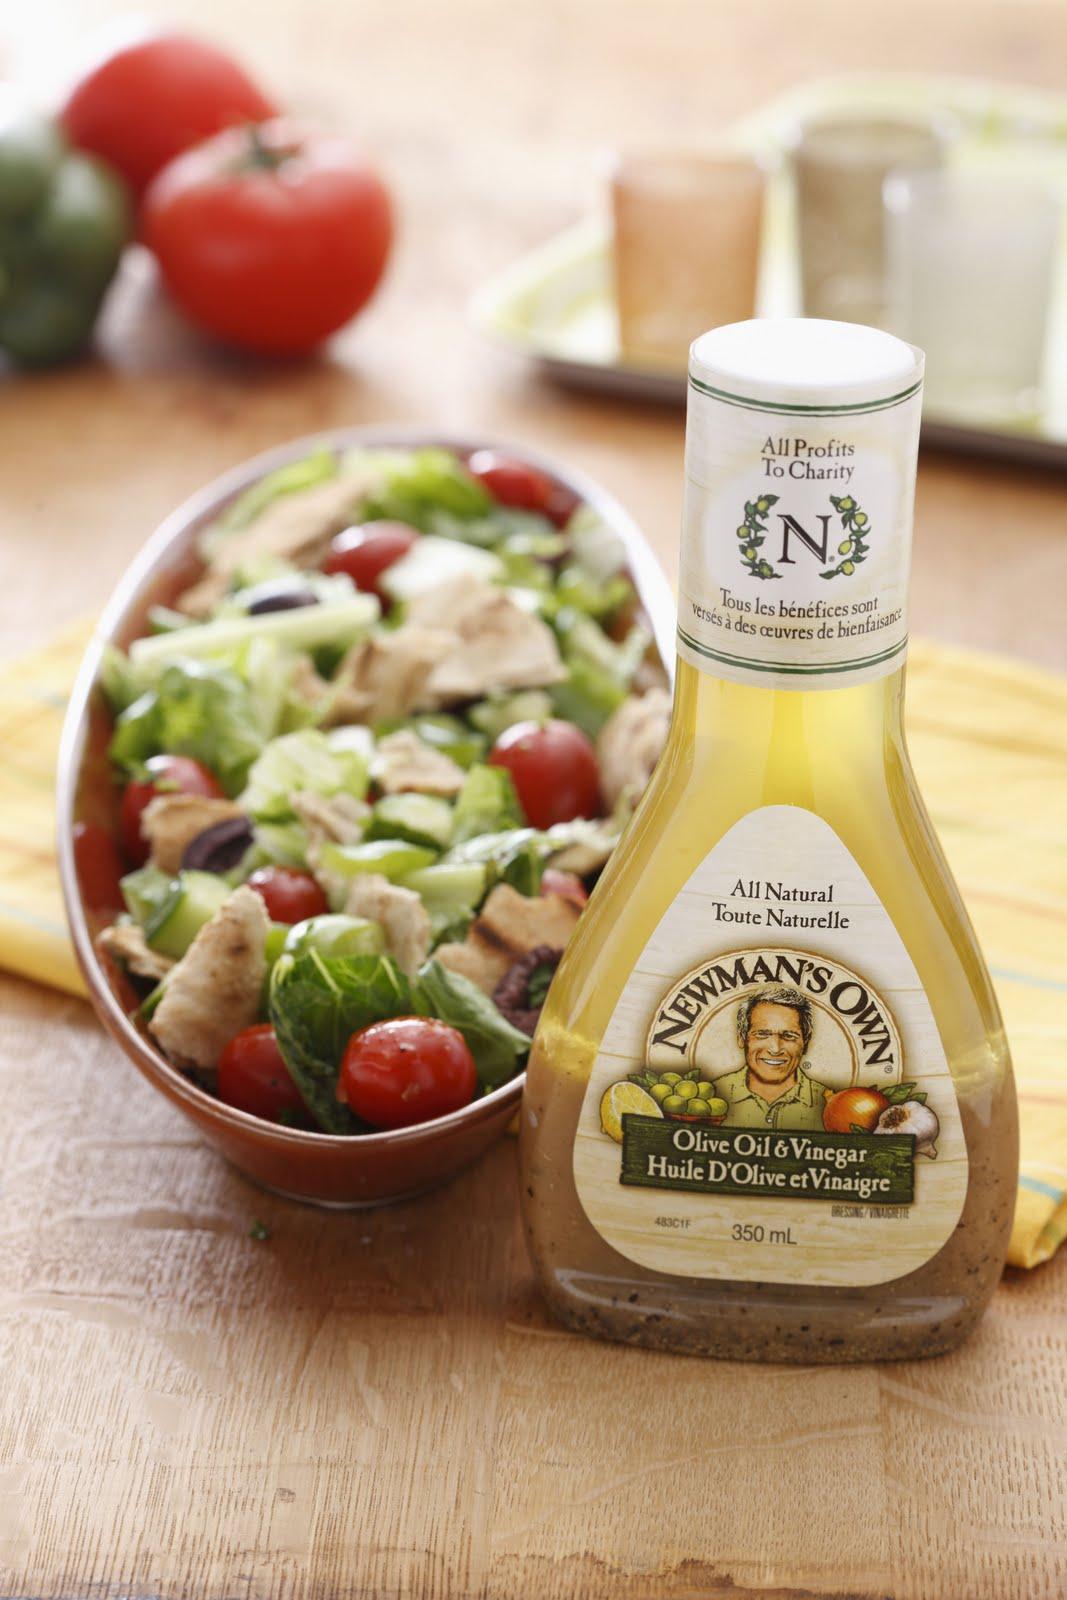 Jetaimelautomne Fattoush Salad Dressing